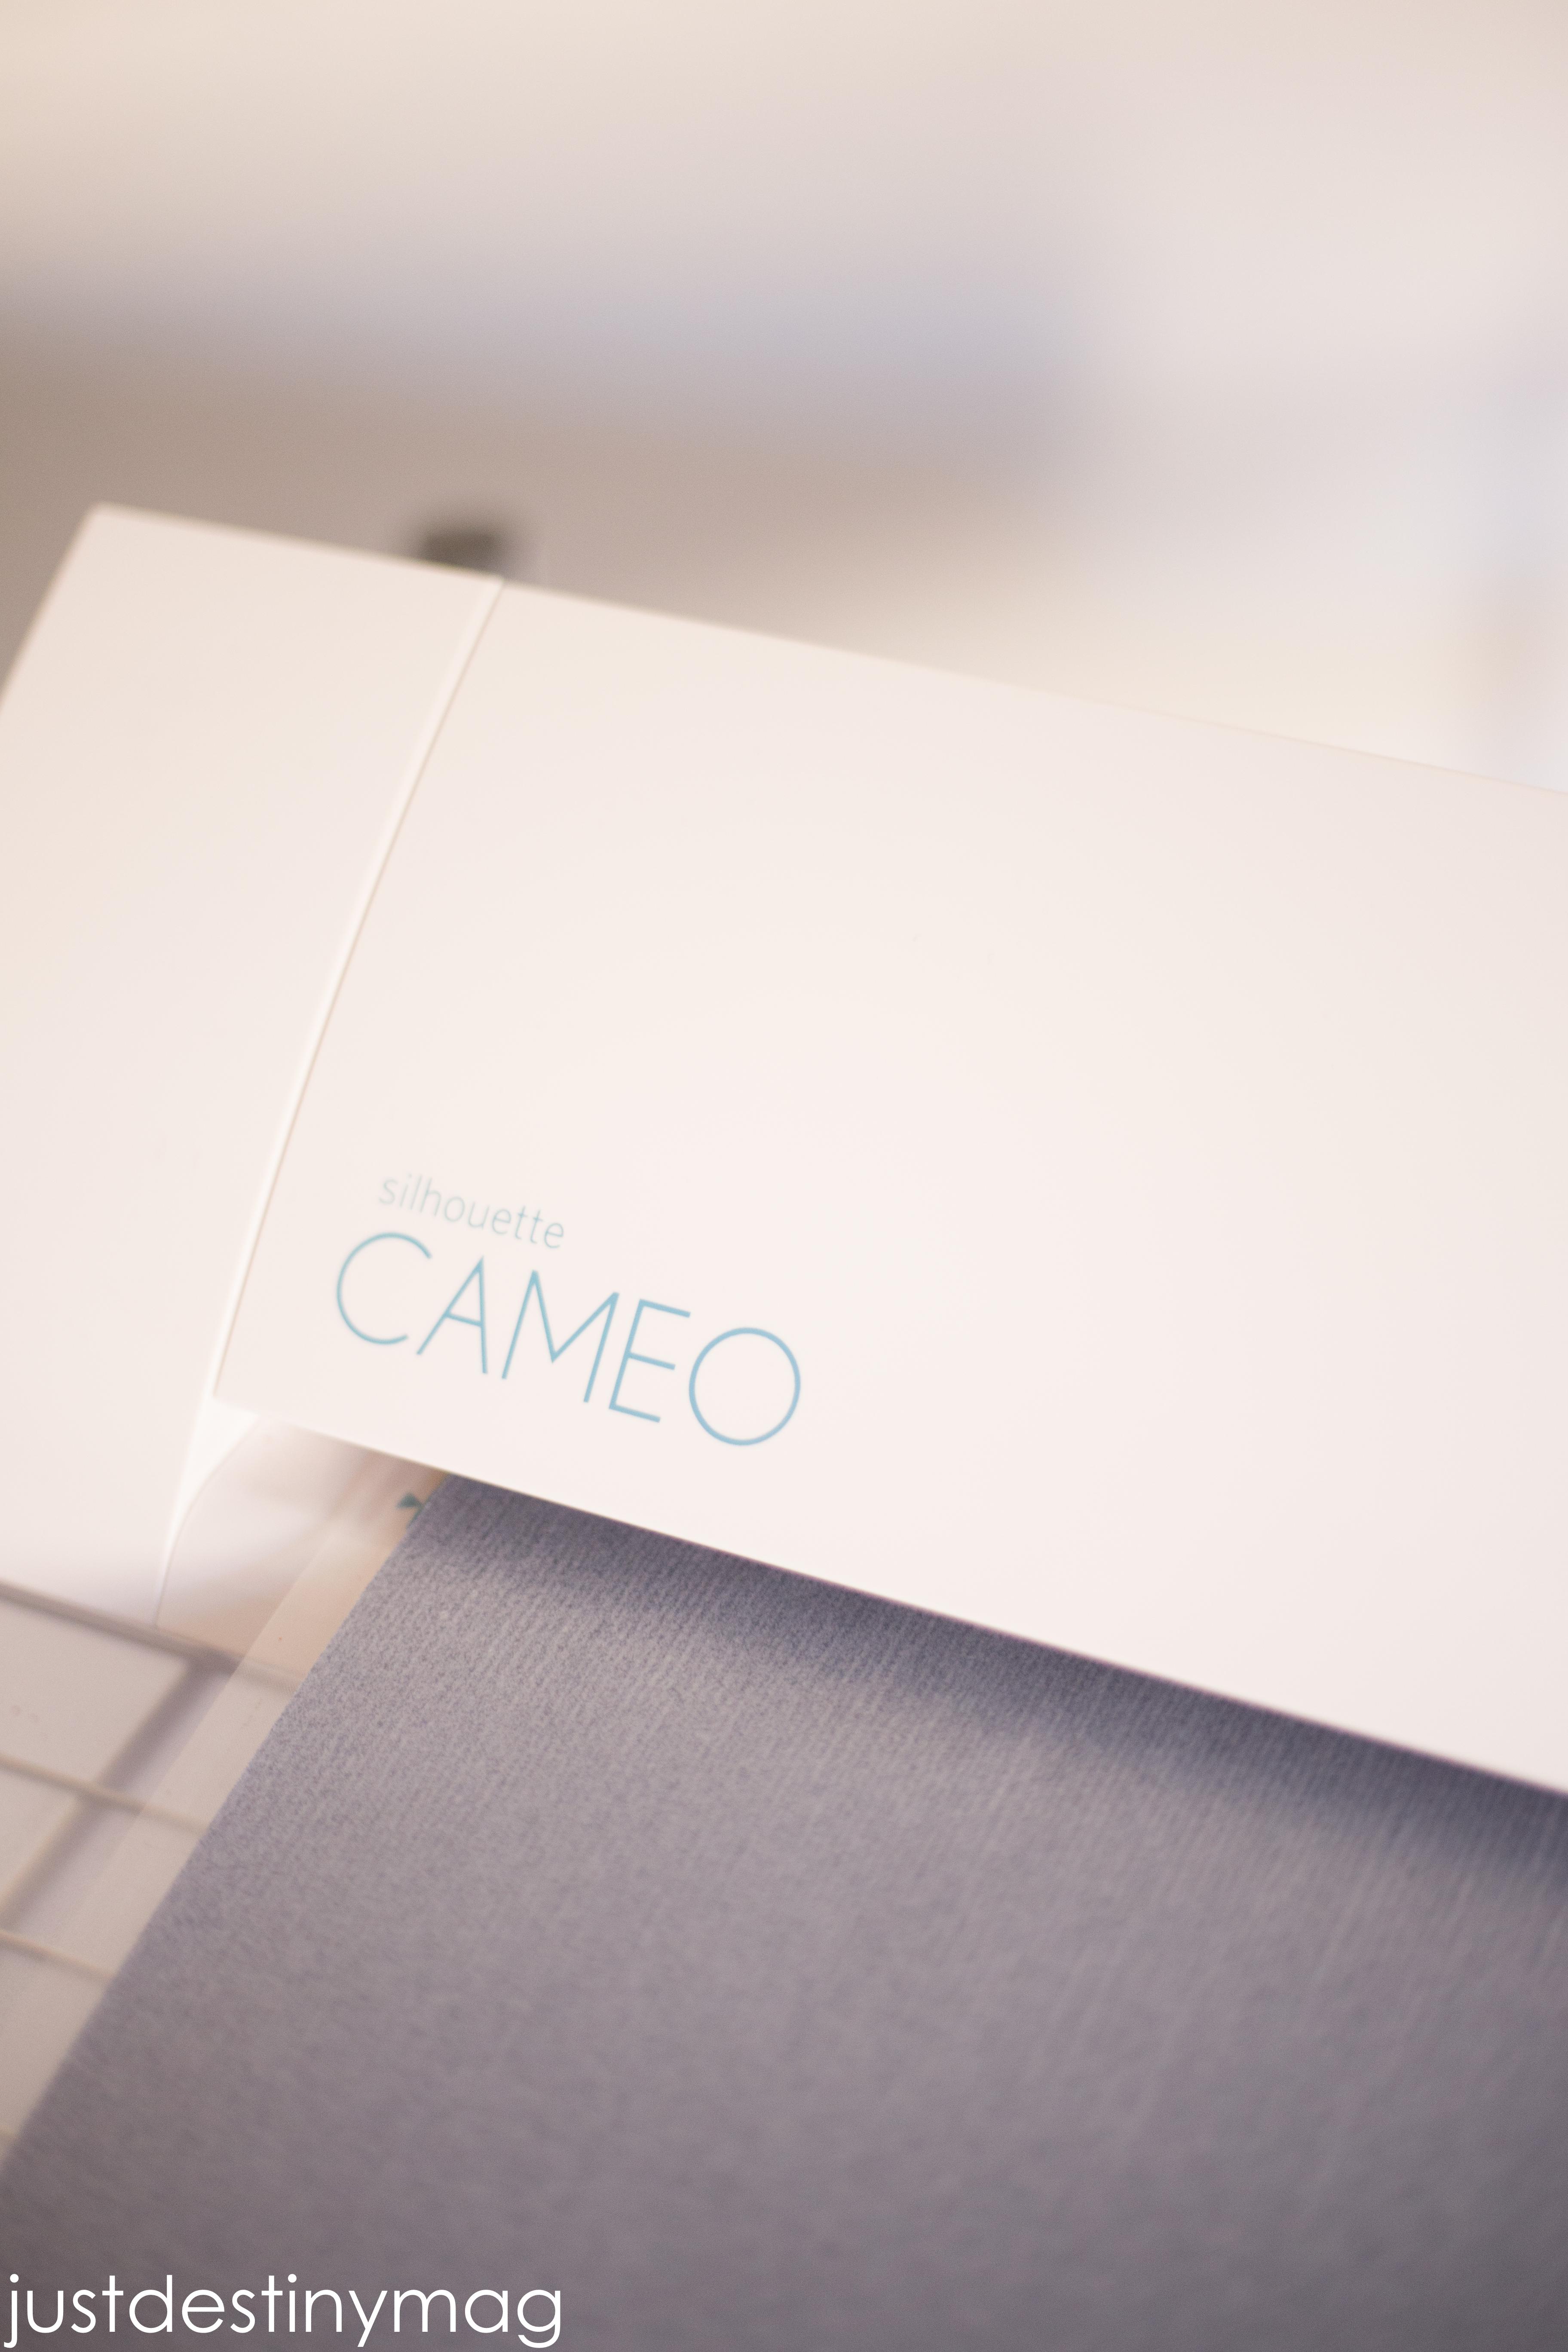 Silhouette Cameo Sale_-4